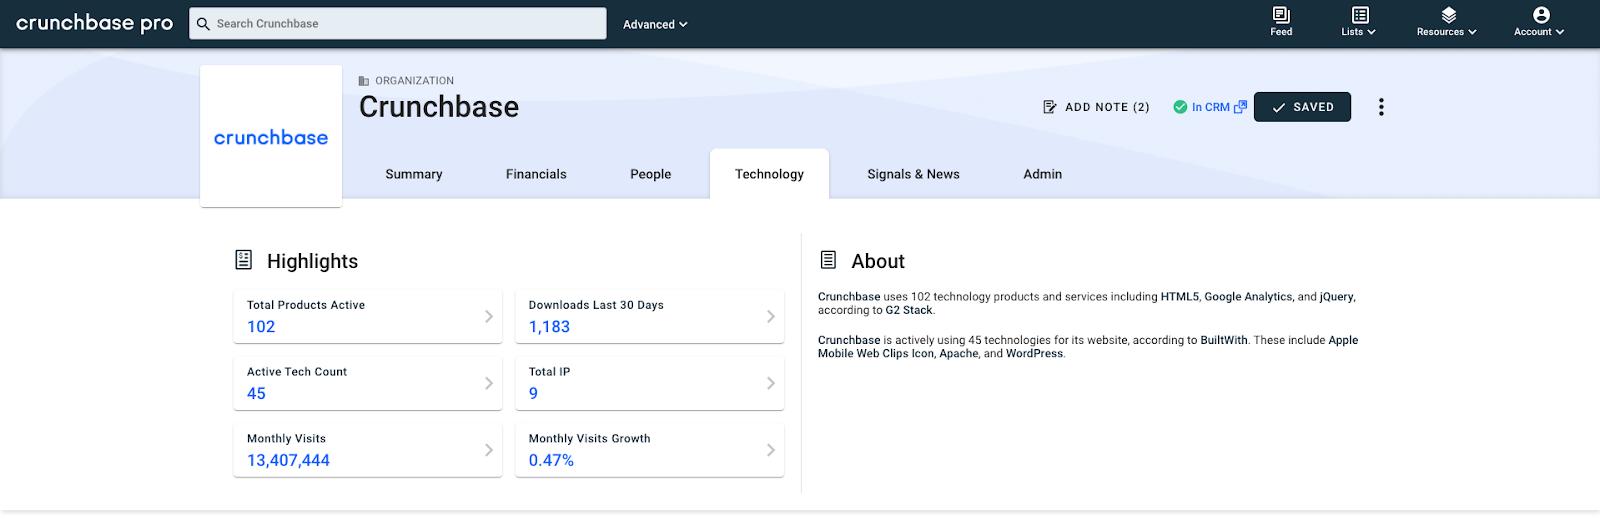 Technology tab on Crunchbase company profile